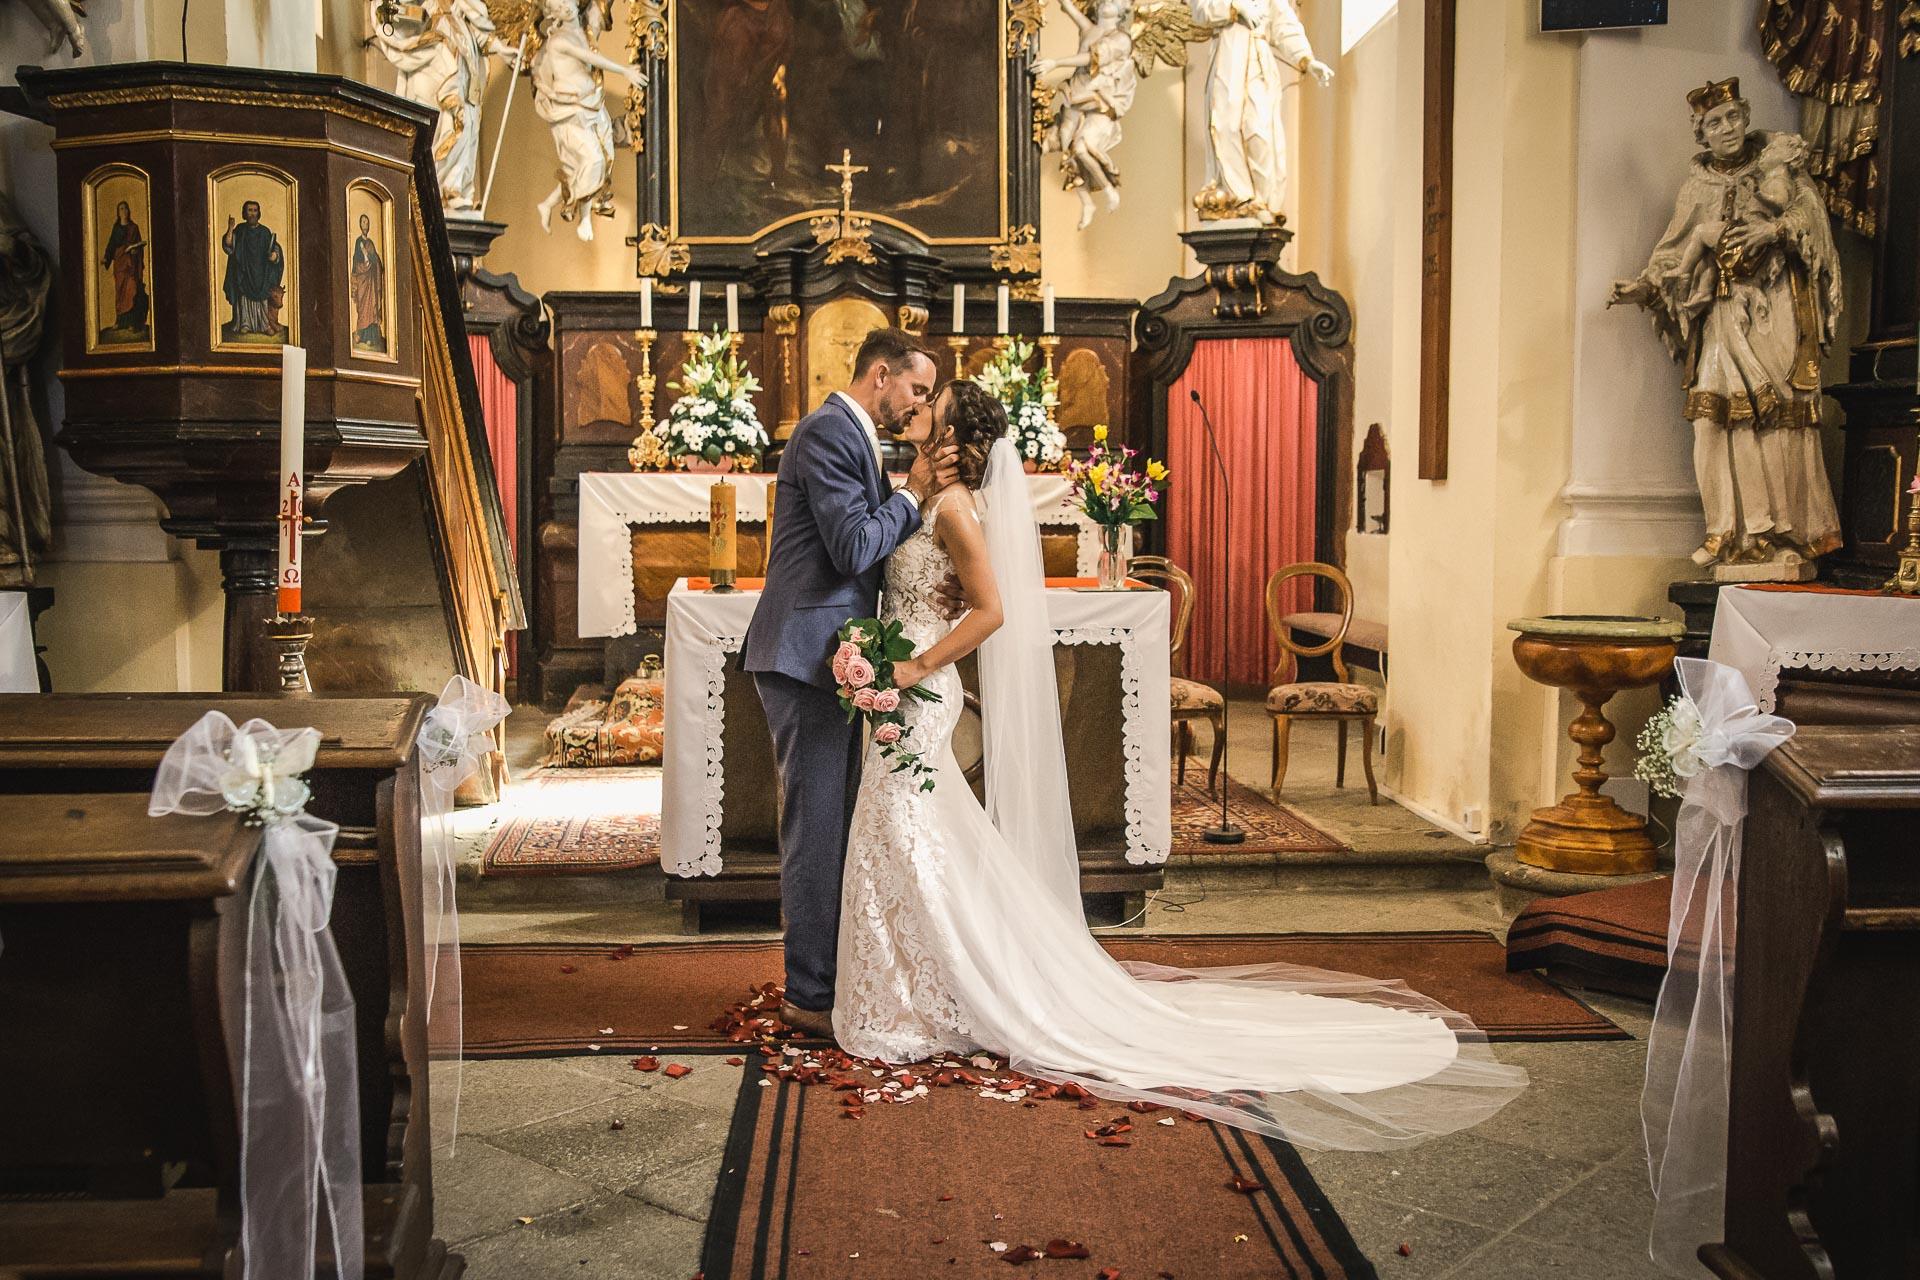 svatební-fotograf-wedding-svatebni-video-orlík-vltava-kostel-statek-stodola-boho-svatba-Beautyfoto-288